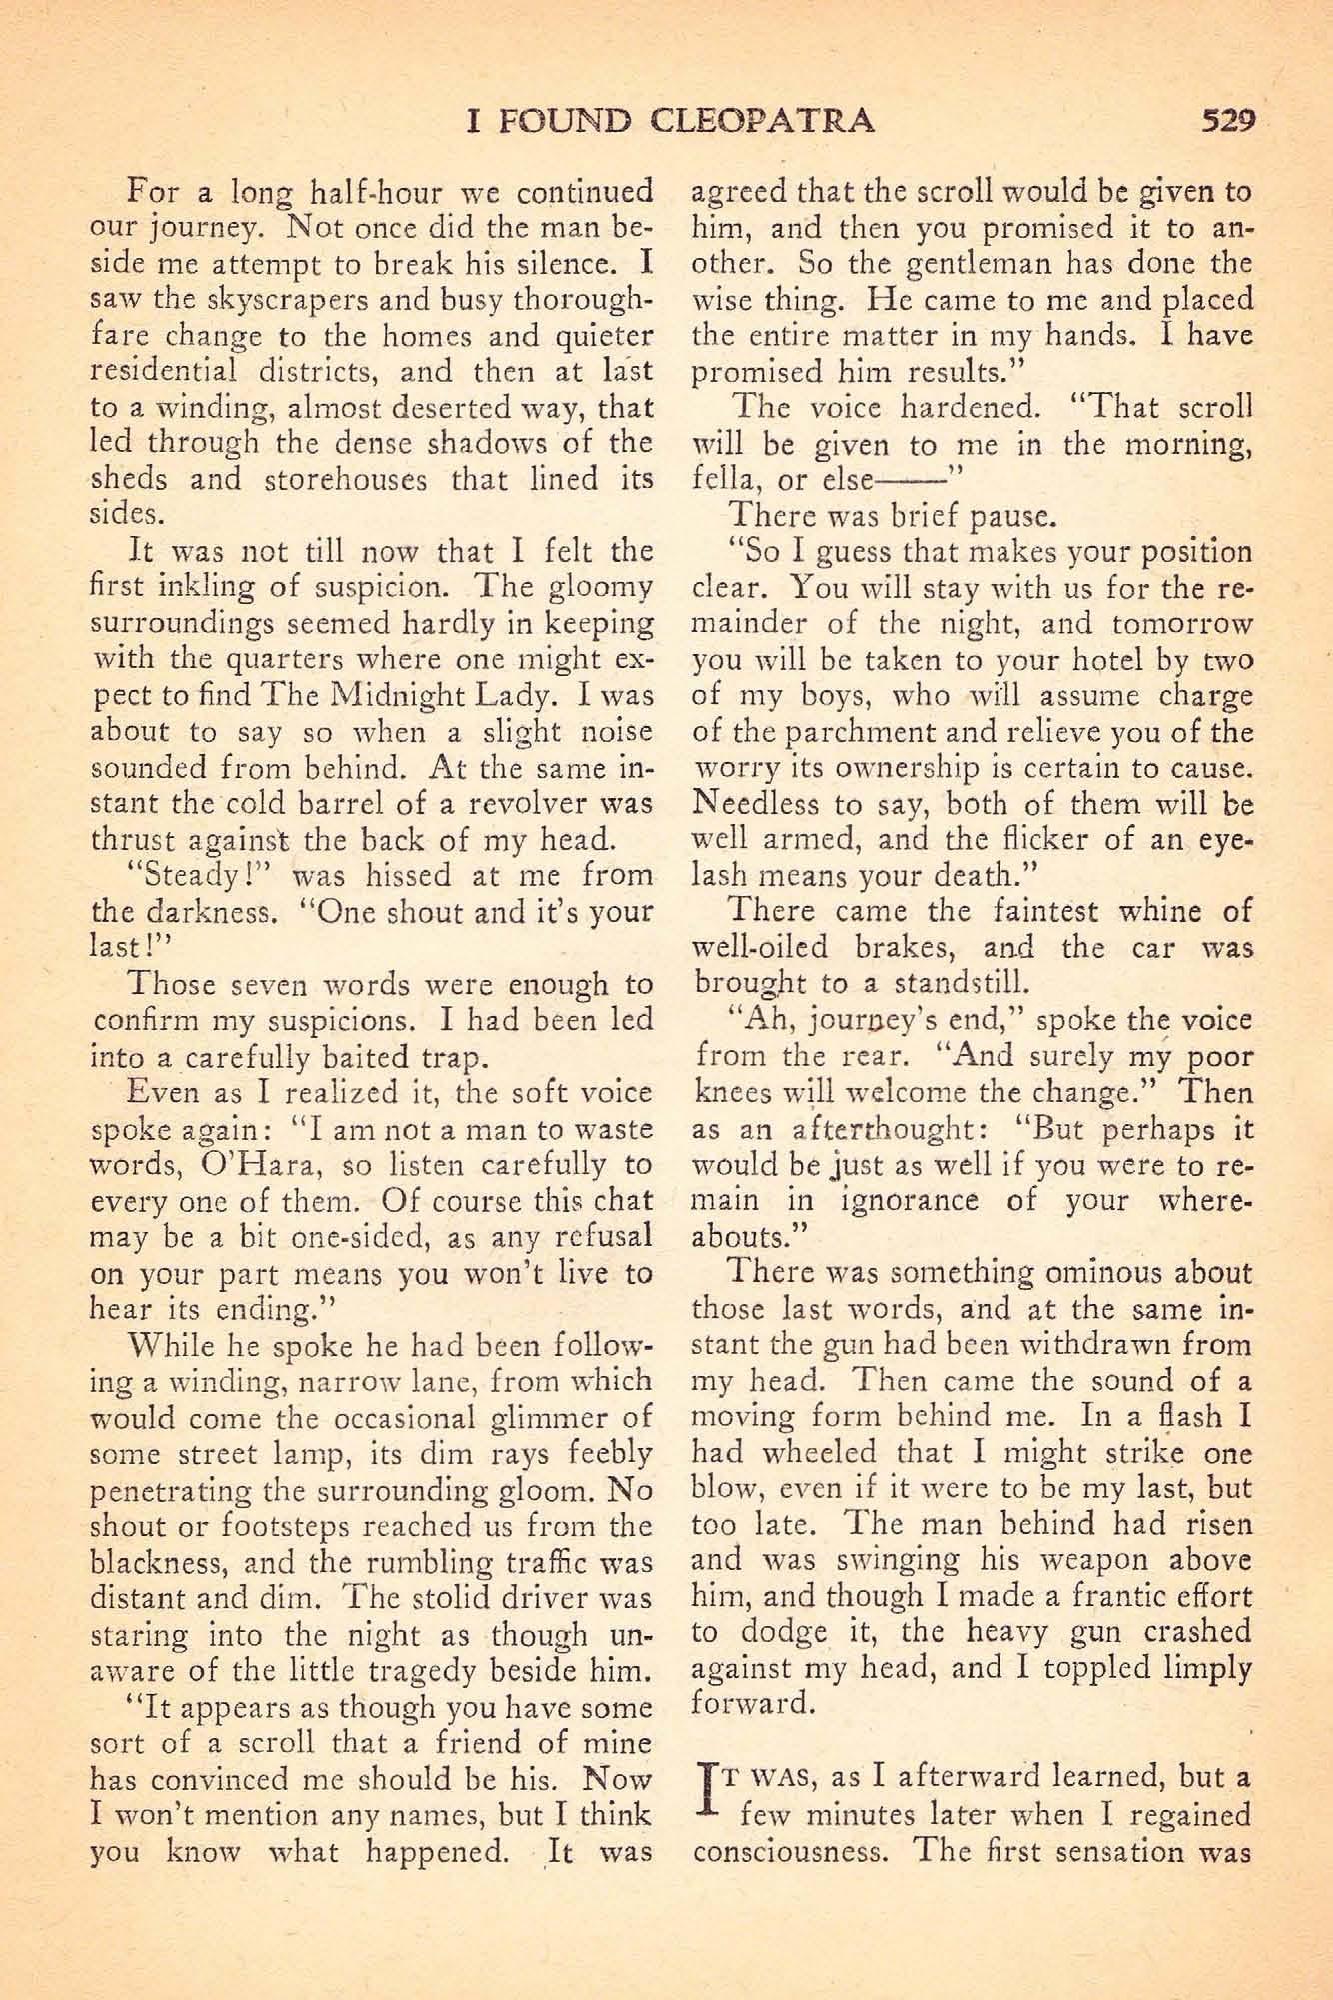 Weird Tales Vol. 32, No. 5 (November 1938), ed. by Farnsworth Wright ...